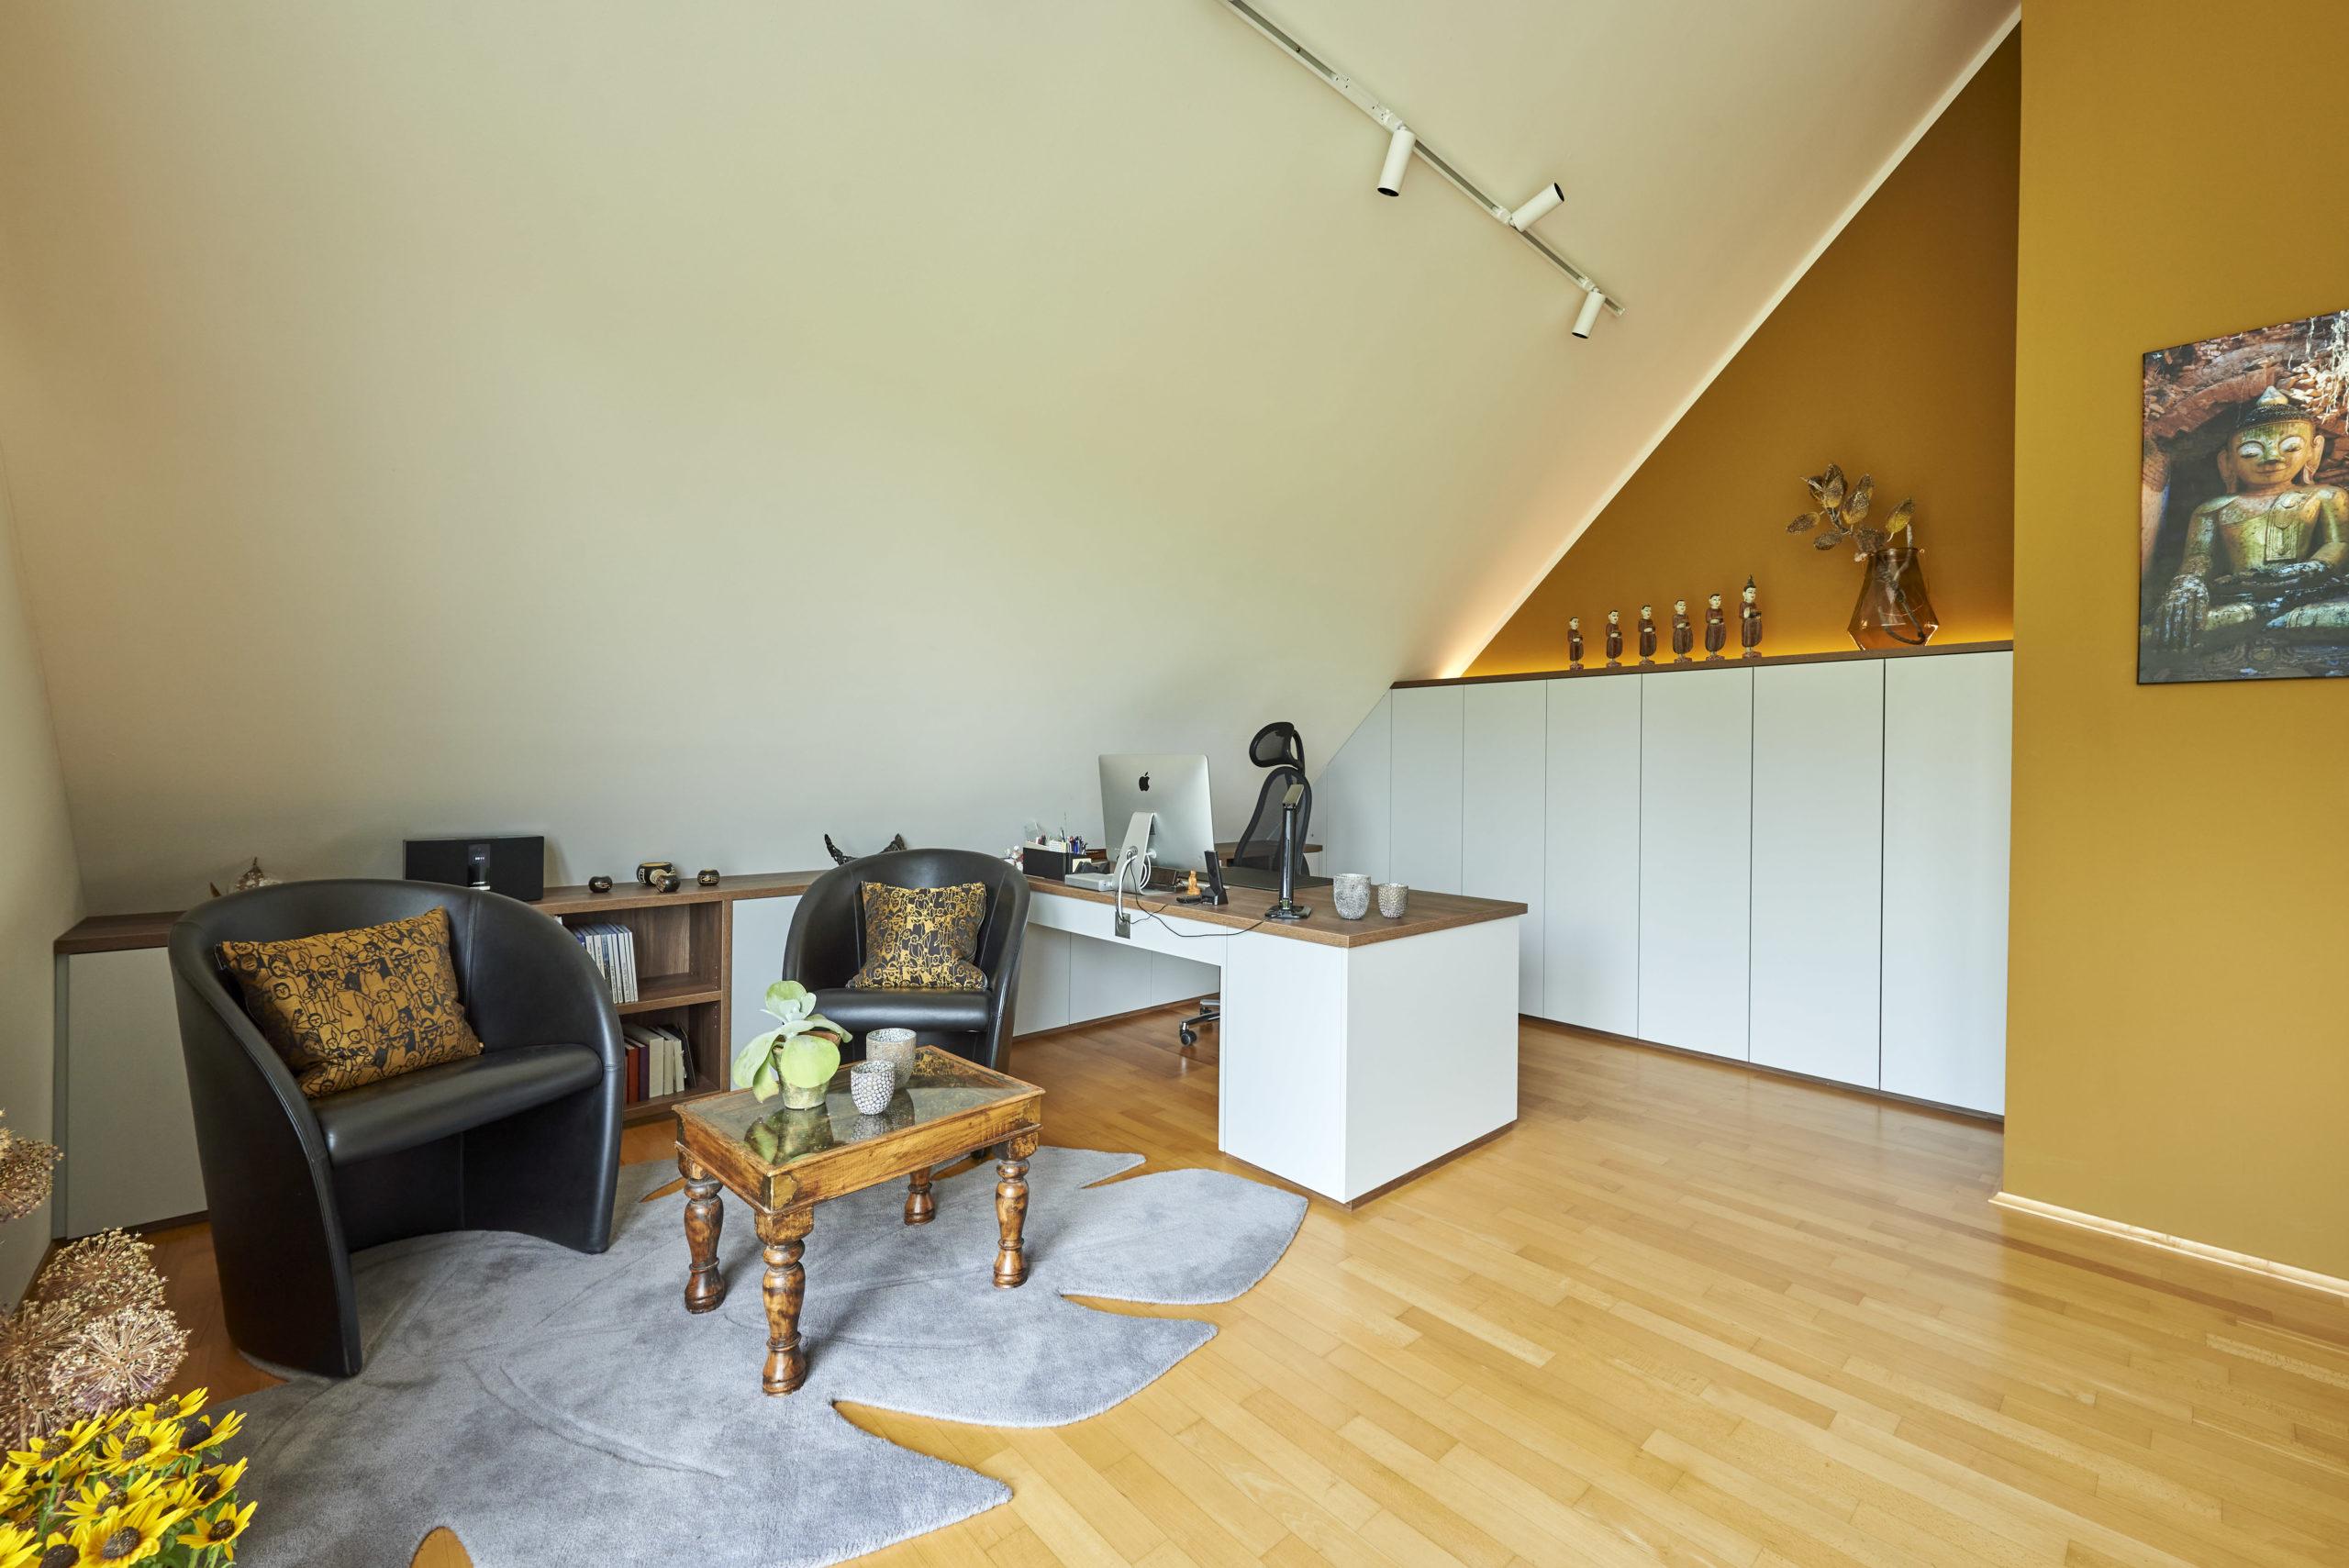 www.ideenraumgeben.de-umgestaltung-eines-grossen-home-office-mit-toller-aussicht-a90c89a6-dfcb-4871-afcb-0744cb794ef6-scaled